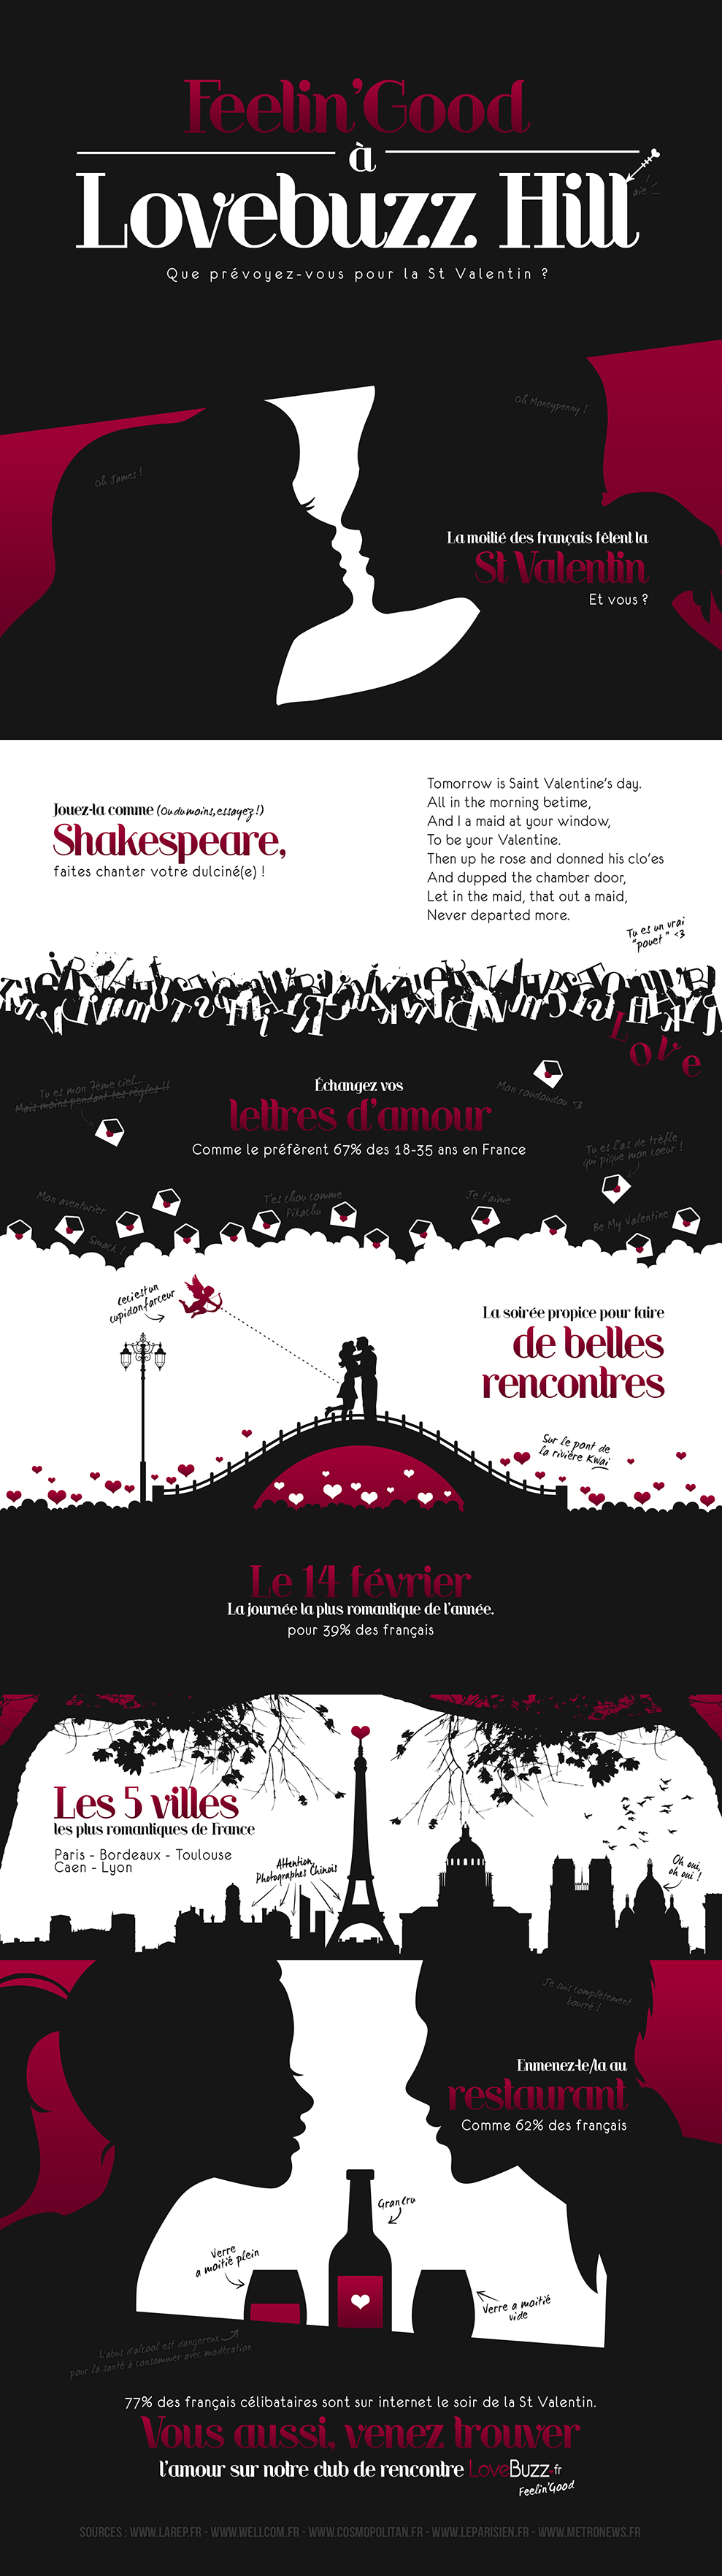 byedel_infographic_saint_valentin_lovebuzz